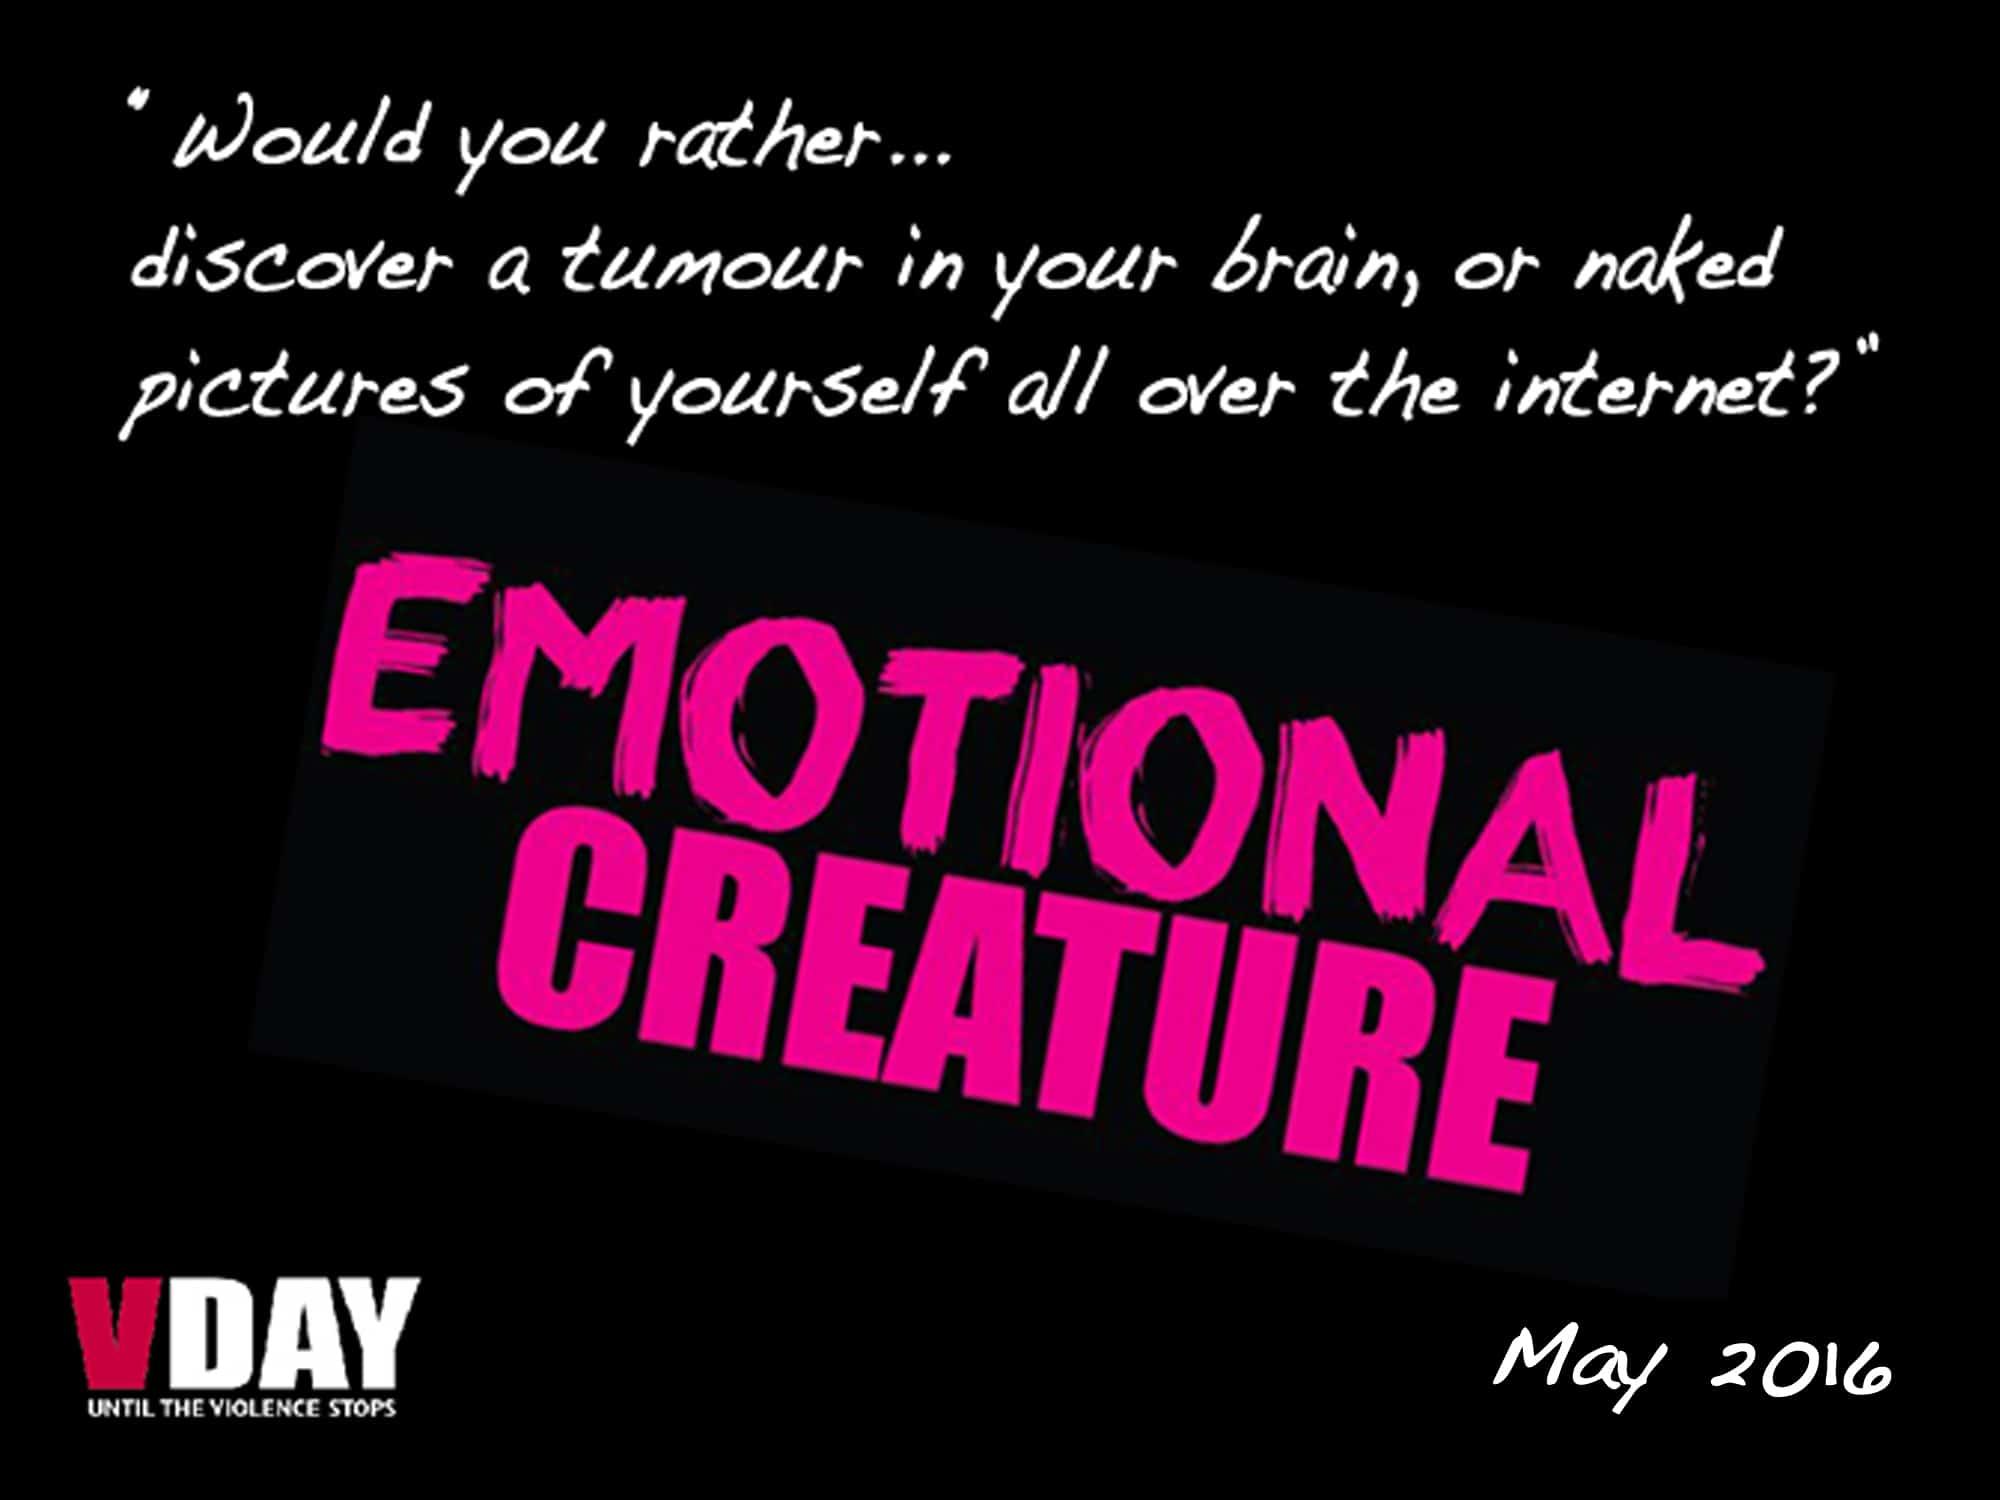 Emotional Creature_GRAPHIC_1